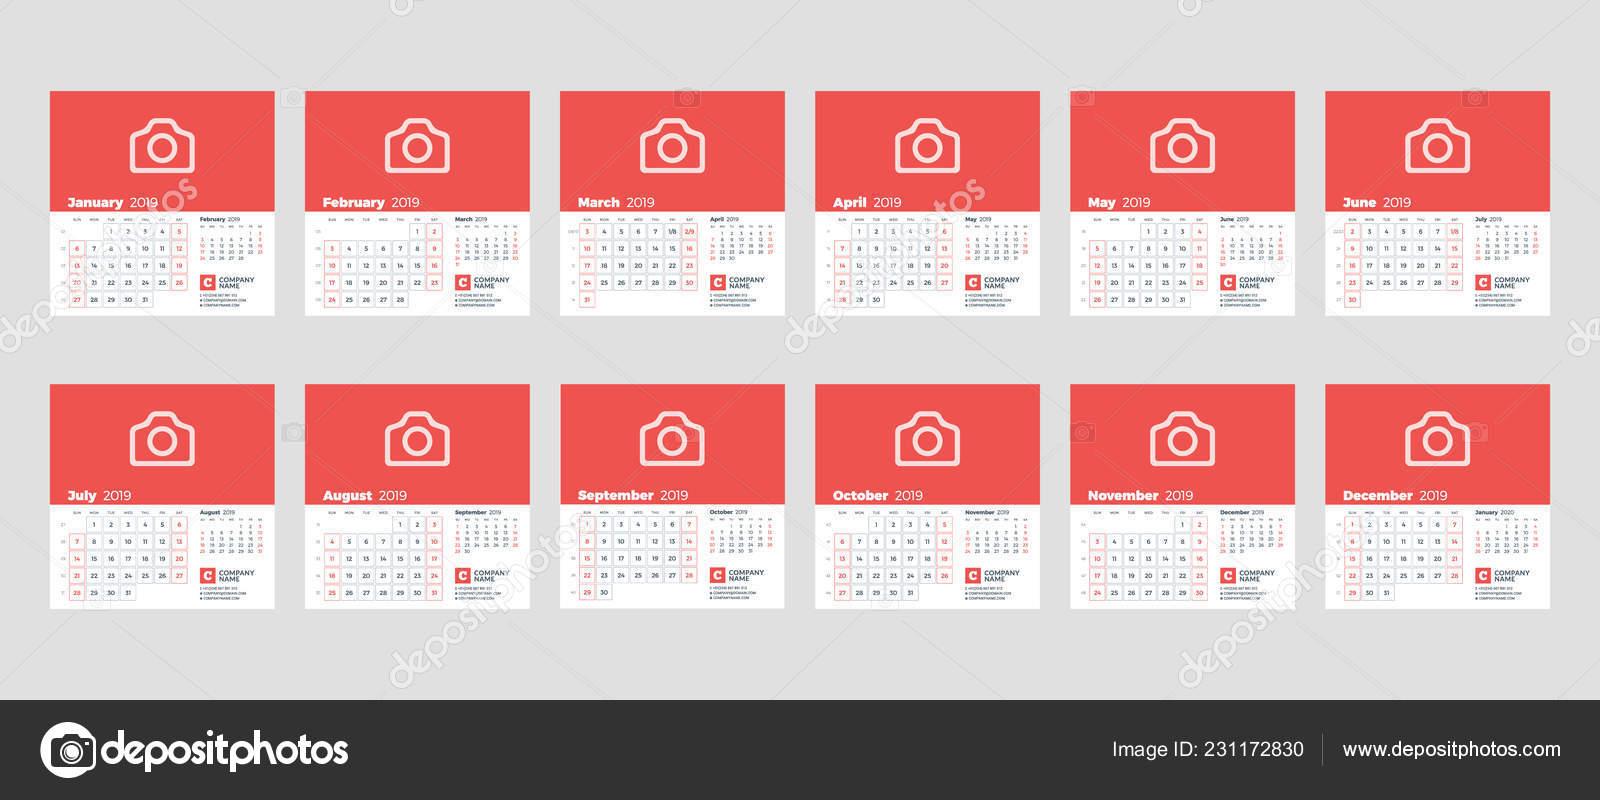 Calendario Giugno Luglio Agosto 2019.Modello Calendario Anno 2019 Set Mesi Gennaio Febbraio Marzo